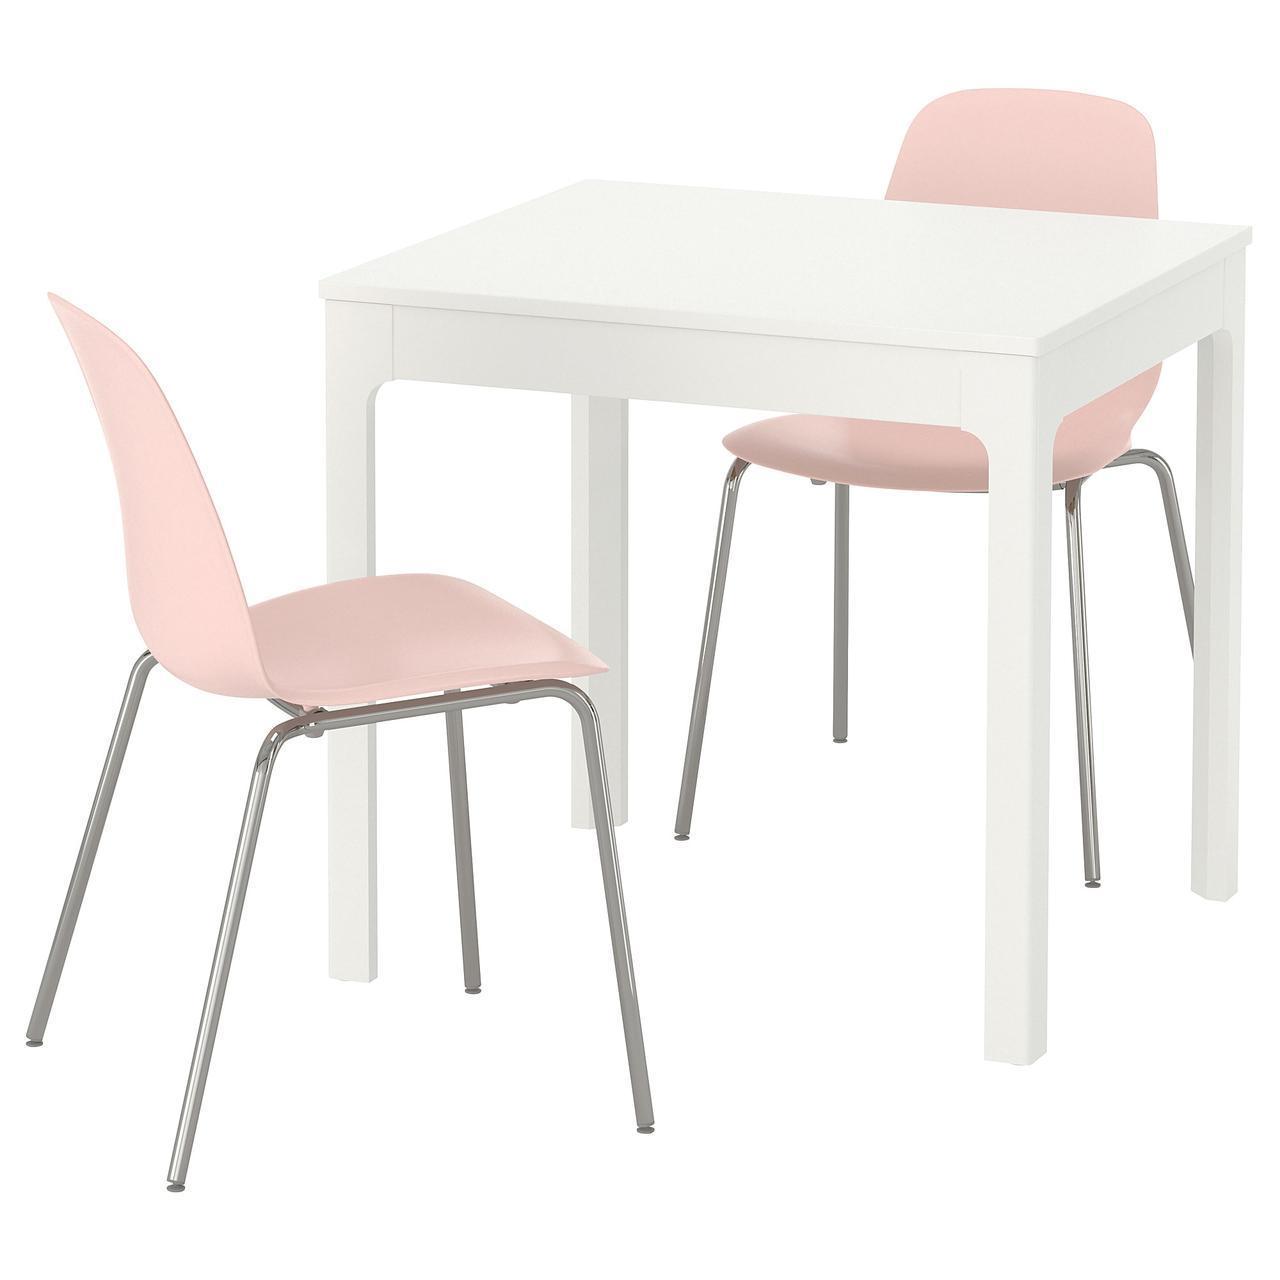 IKEA EKEDALEN/LEIFARNE Стол и 2 стула, белый, розовый  (992.213.28)